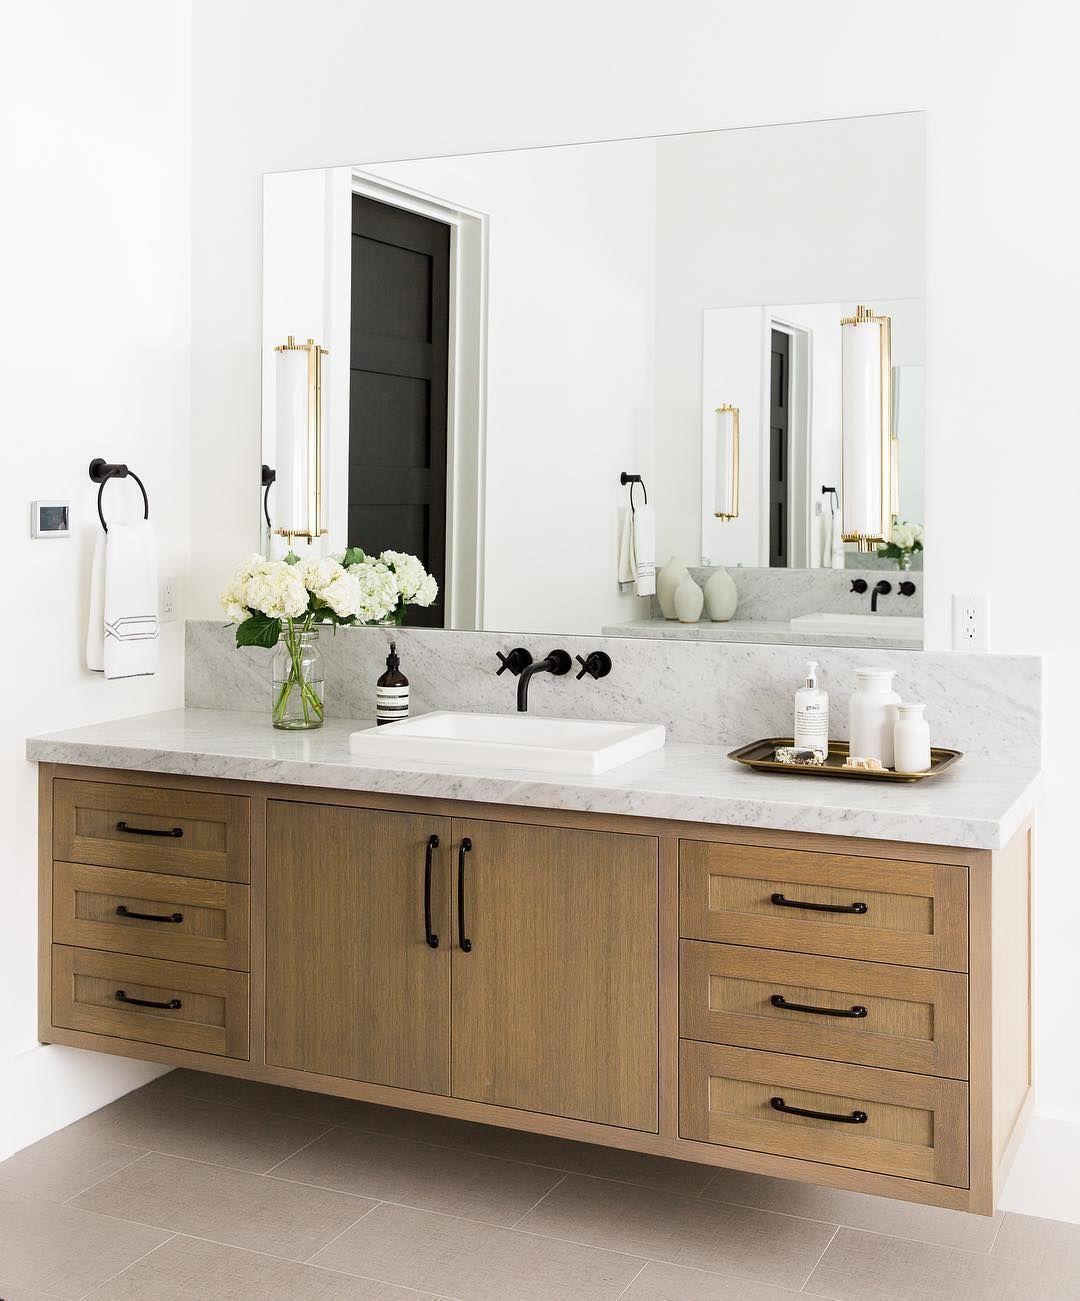 brass sconces over plate mirror stained wood vanity black on vanity bathroom id=62093